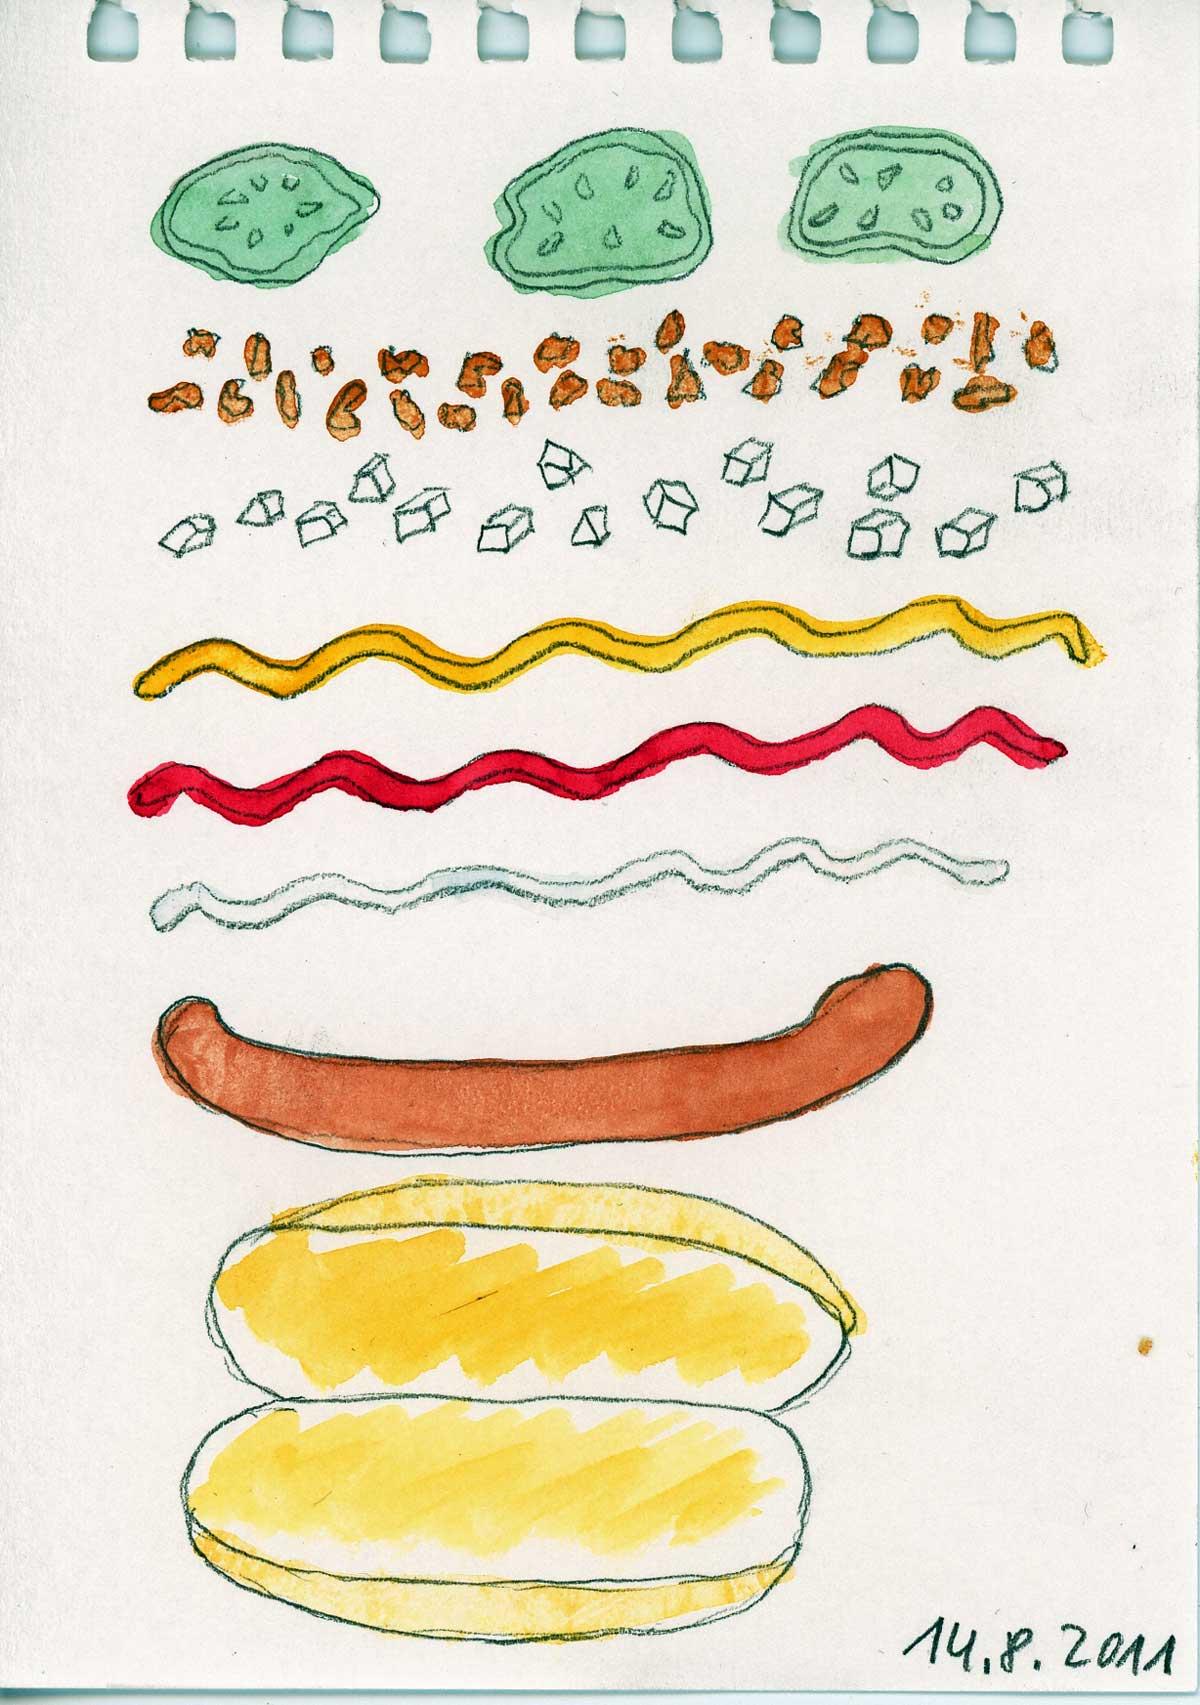 Be Creative #226 - A delicious Danish hot dog, © Ines Häufler, 2011